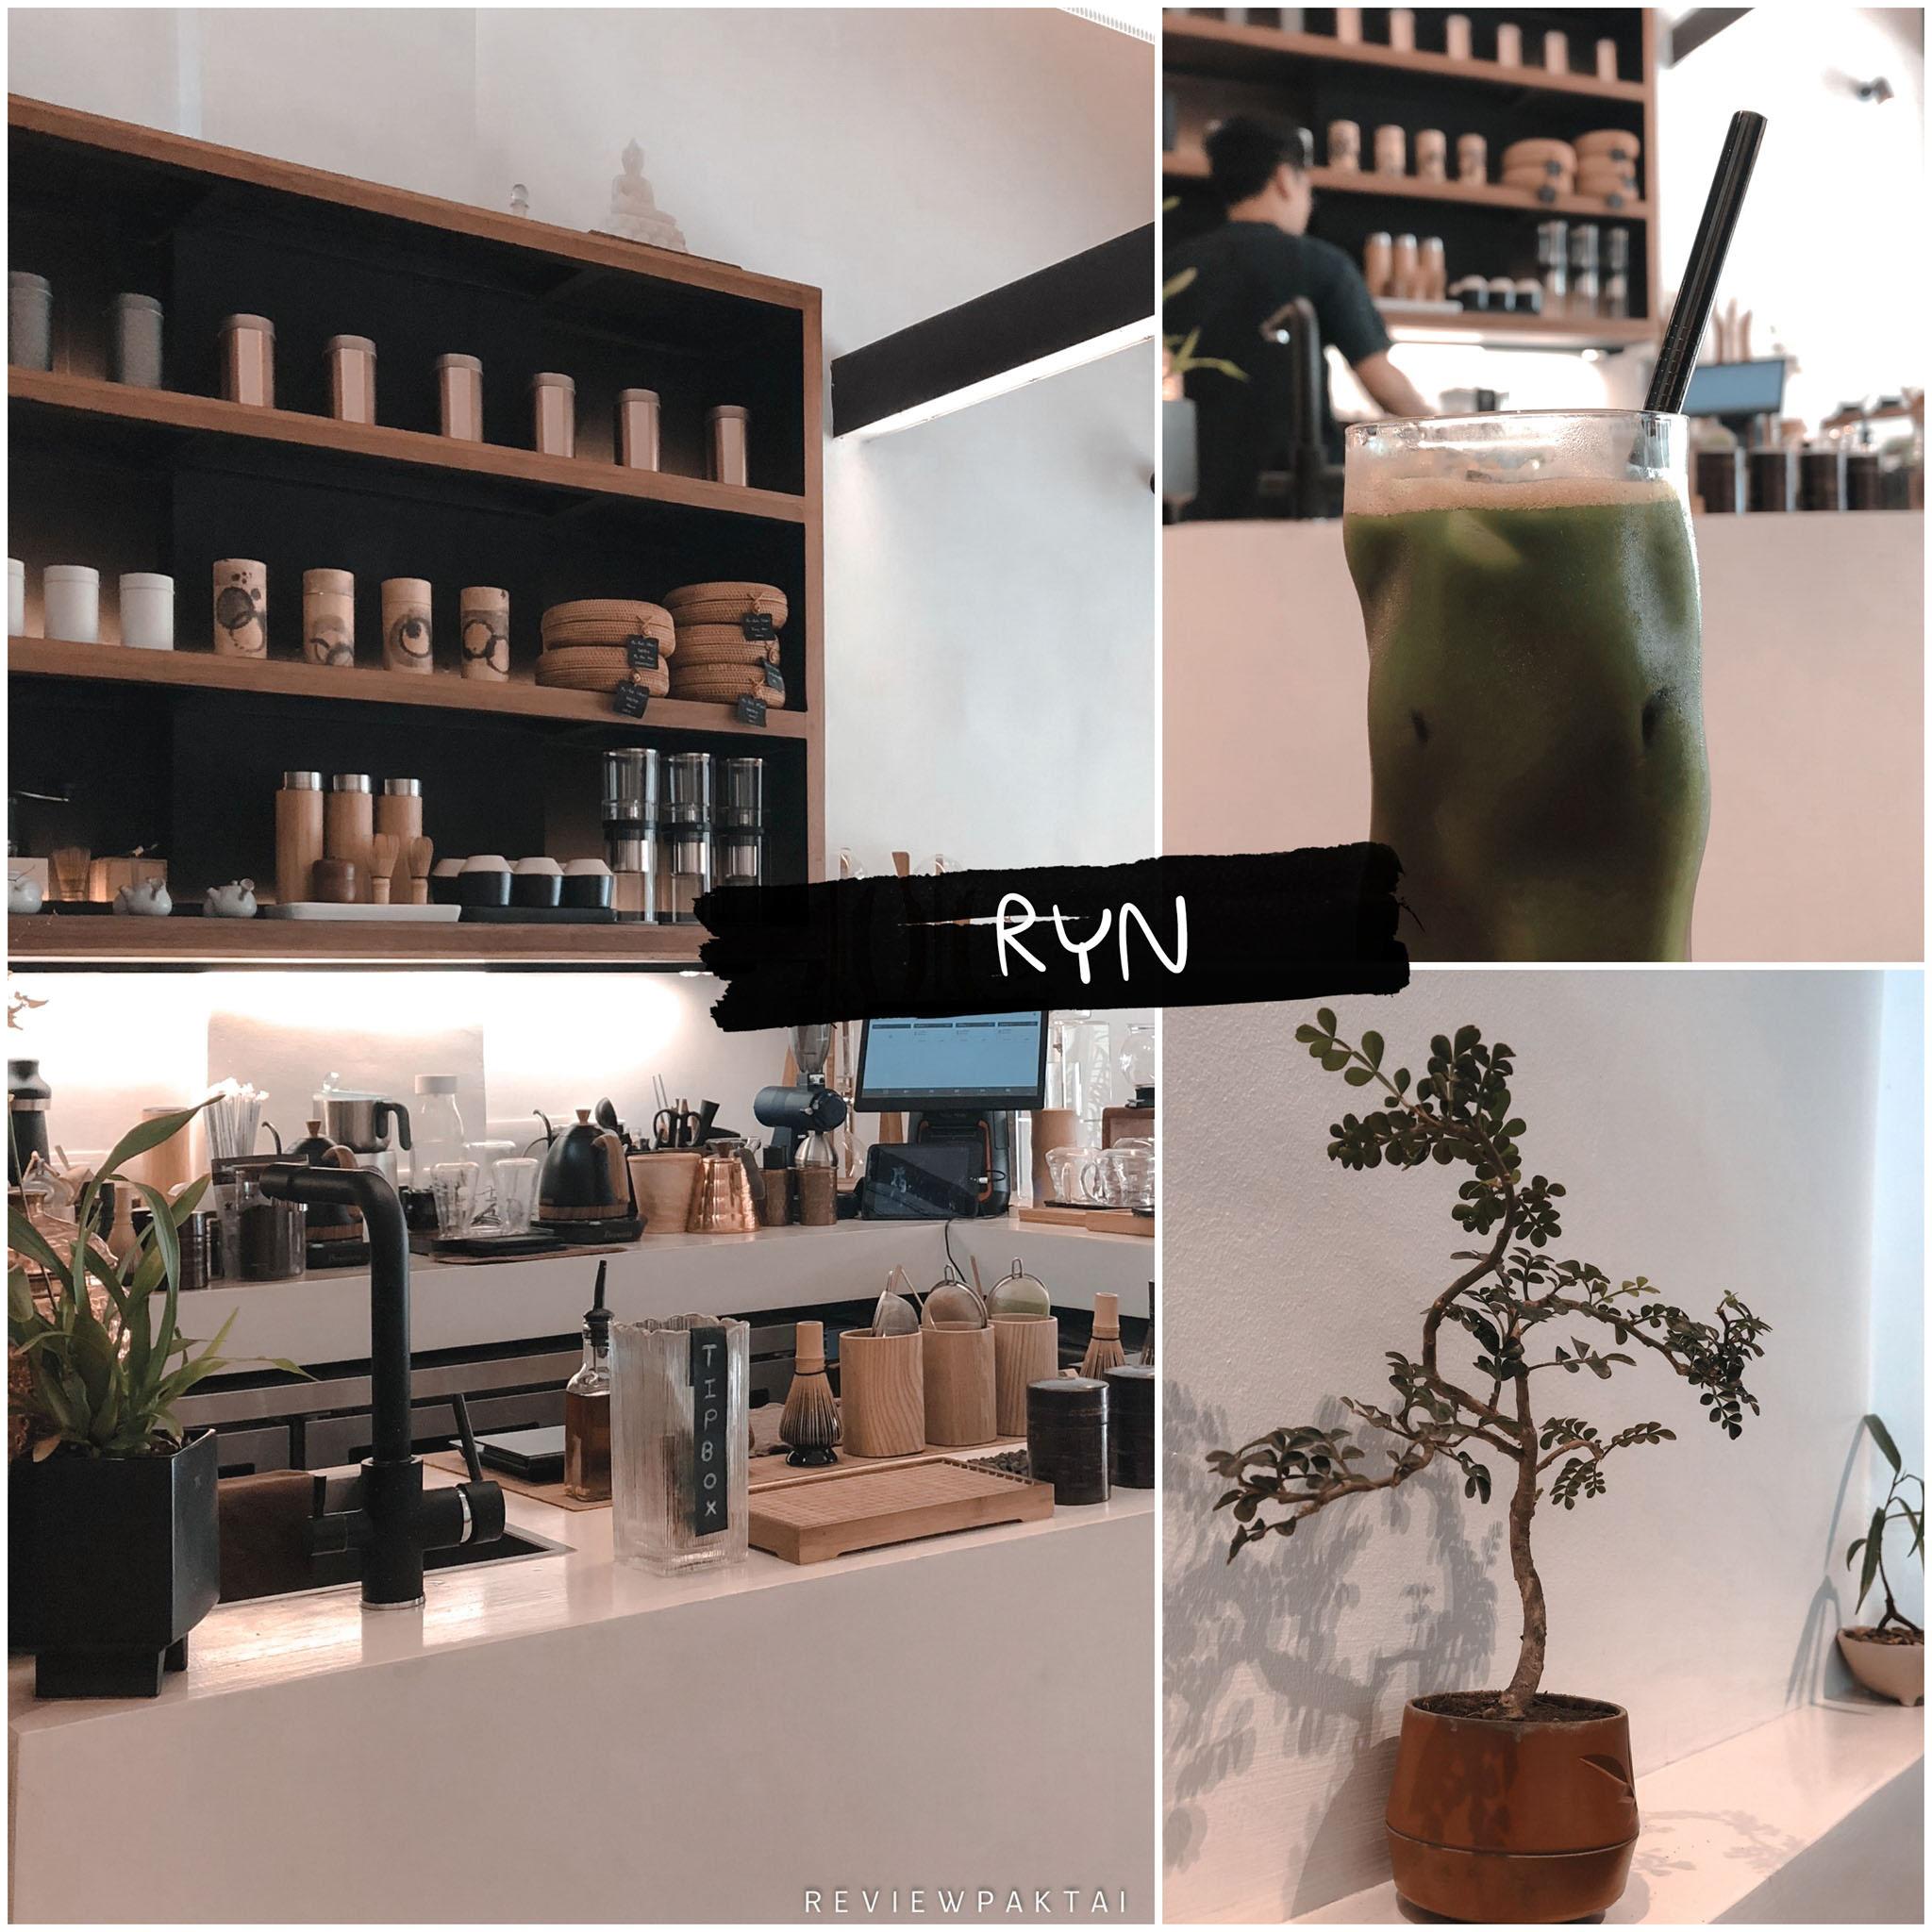 Ryn-Authentic-Tea---Slow-Drop-Coffee ร้านมีความเป็นสไตล์ตัวเองสูงมากเหมาะกับการไปกินของหวานและชาต่างๆความอร่อยไม่ต้องพูดถึงอร่อยแน่นอนเรื่องนั้นแต่ที่ชอบมากกกกคือสไตล์ของร้านร้านมีความเป็นญี่ปุ่น-แถมยังมี2ชั้นตกแต่งด้วยโทนขาว-ดำ-น้ำตาล-คงความอบอุ่นไว้พี่ๆบาริสต้ามีความรู้เรื่องชาพอสมควร-คอยแนะนำเมนูต่างๆได้ไม่มากก็น้อยสามารถถามได้เลย-และอธิบายเครื่องดื่มแต่ละอย่างให้ฟังอย่างชัดเจนไม่น่าเบื่อแถมได้ความรู้อีกด้วย-มีมุมสวยๆ-ให้ถ่ายรูปอีกต่างหากเหมาะมากๆ ภูเก็ต,คาเฟ่,ที่เที่ยว,ร้านกาแฟ,เด็ด,อร่อย,ต้องลอง